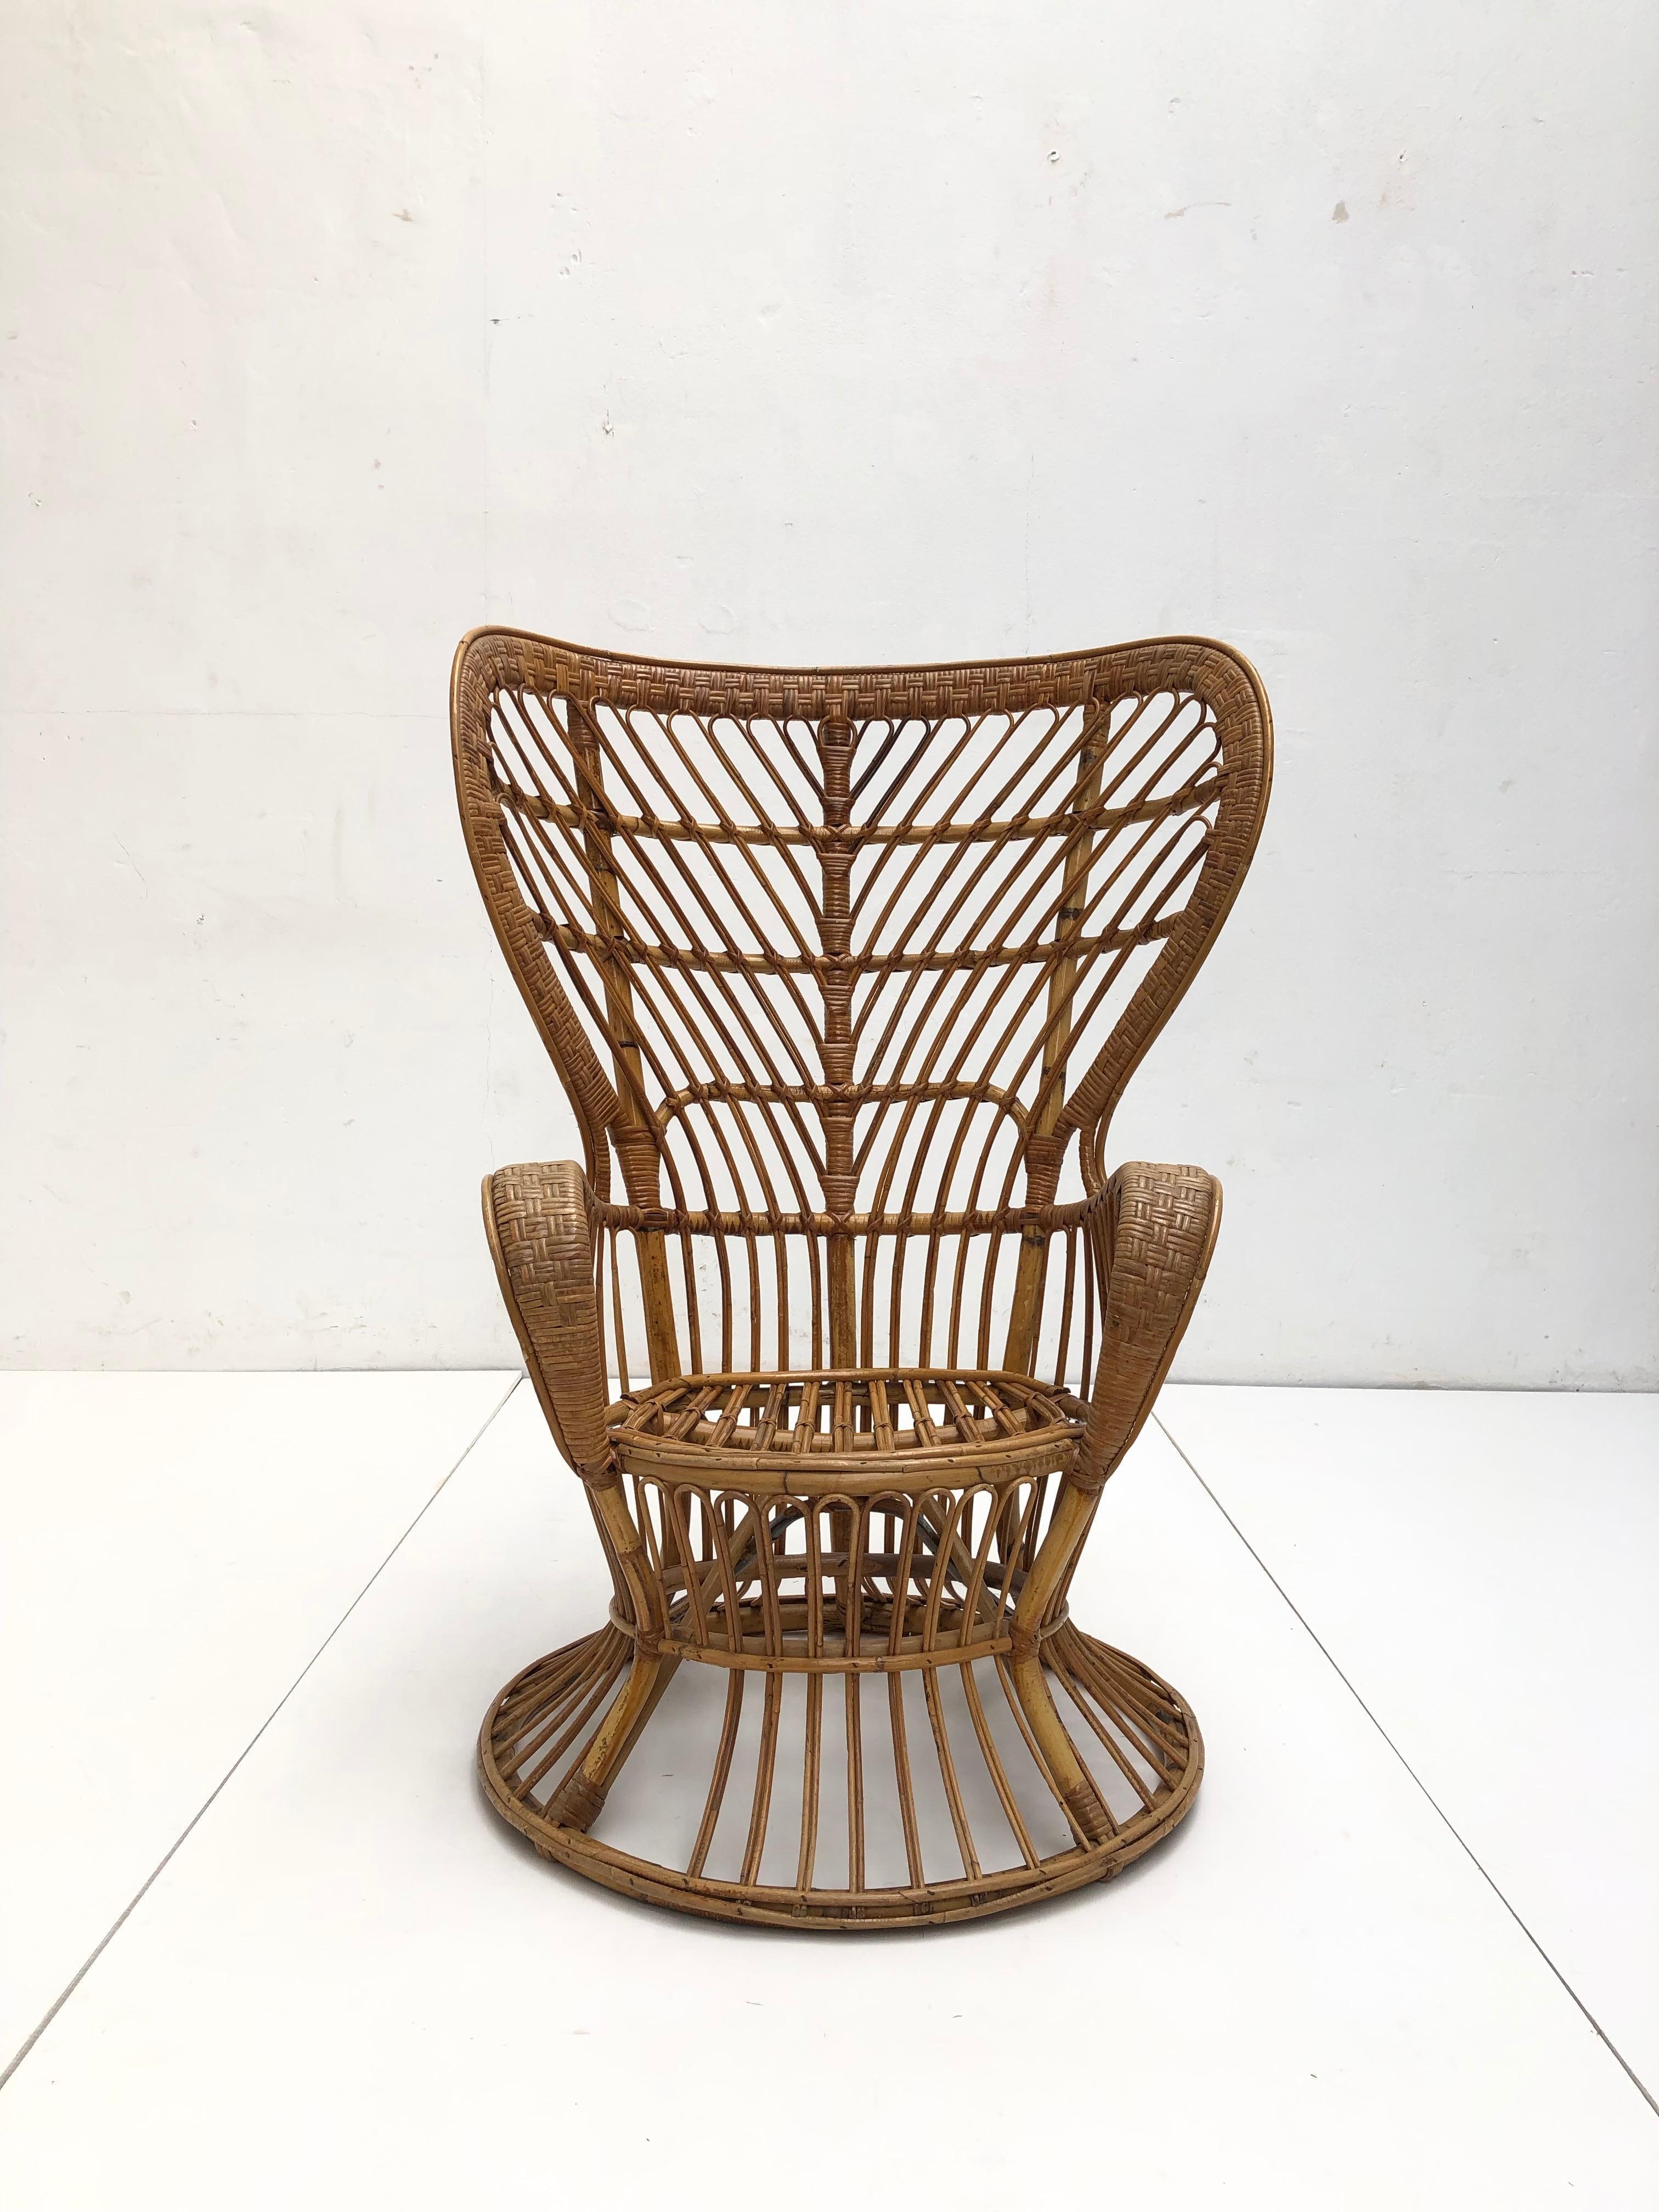 Bamboo Wicker Lio Carminati Carlo Mollino Chair Bonacina Italy 1950s